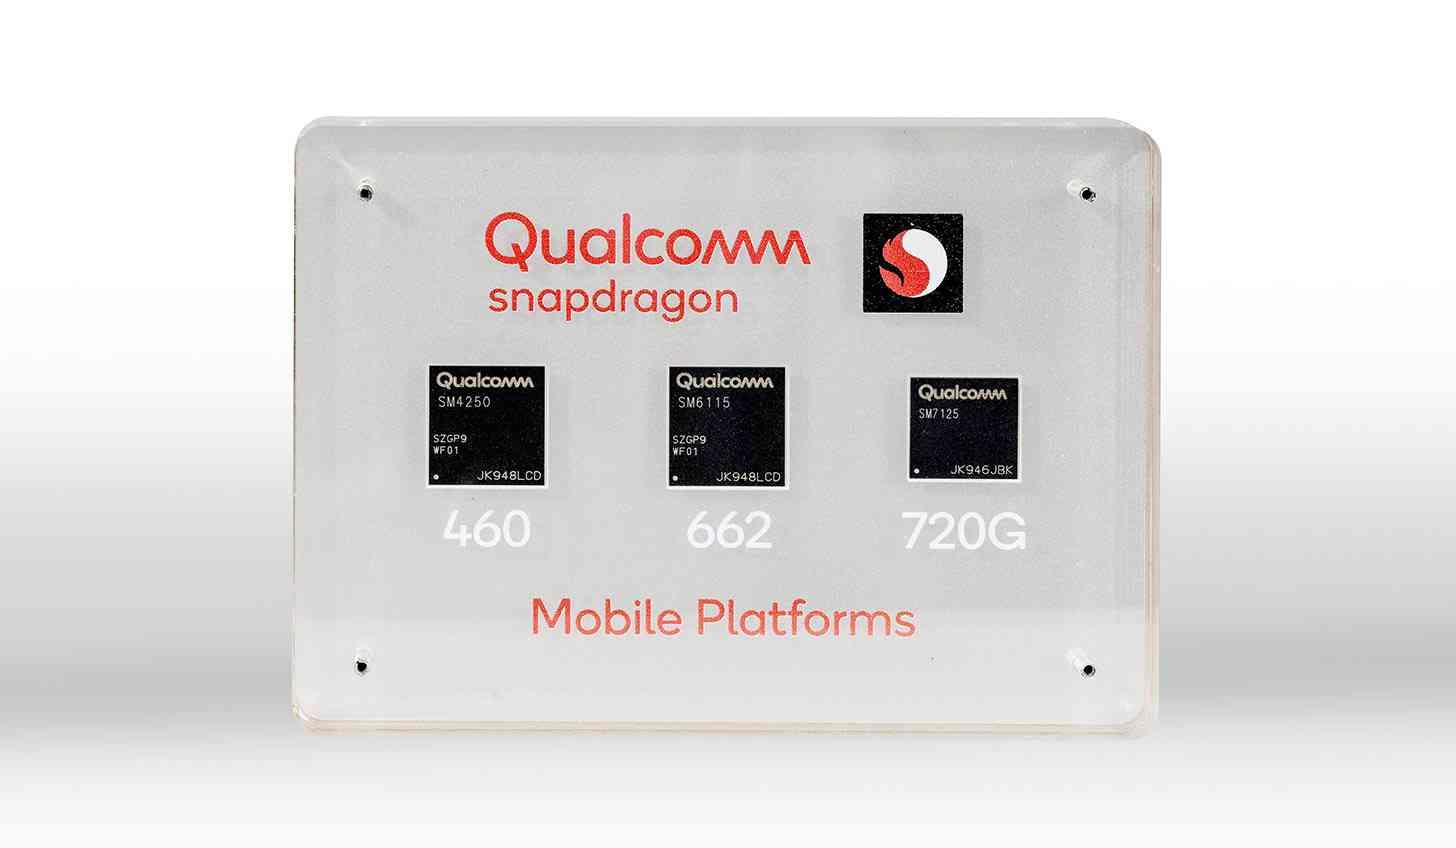 Snapdragon 720G, 662, 460